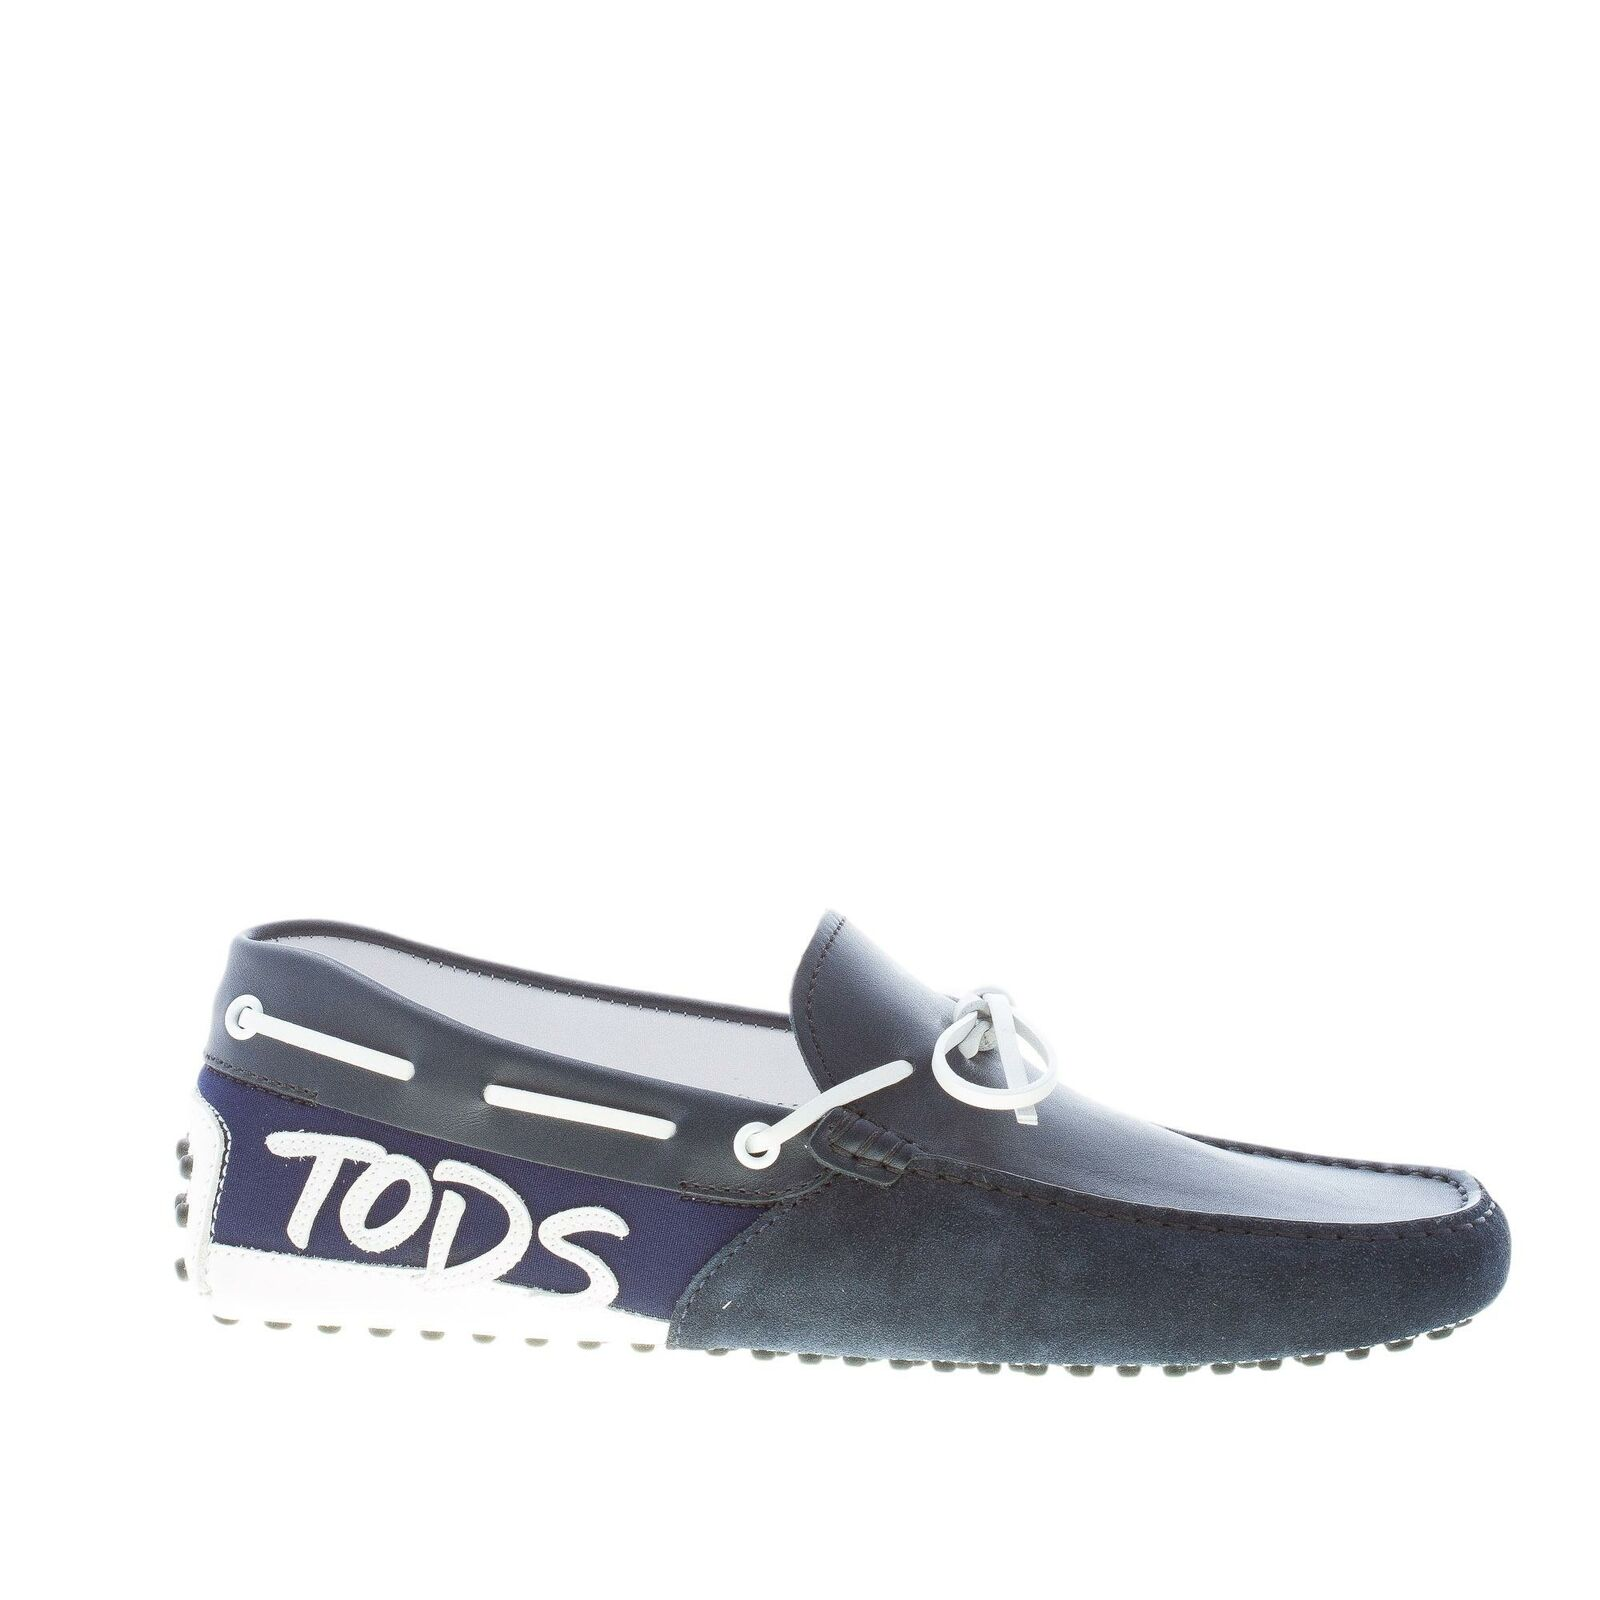 TOD'S Chaussures Hommes Bleu Velour Cuir Cuir GOMMINI Mocassins with logo